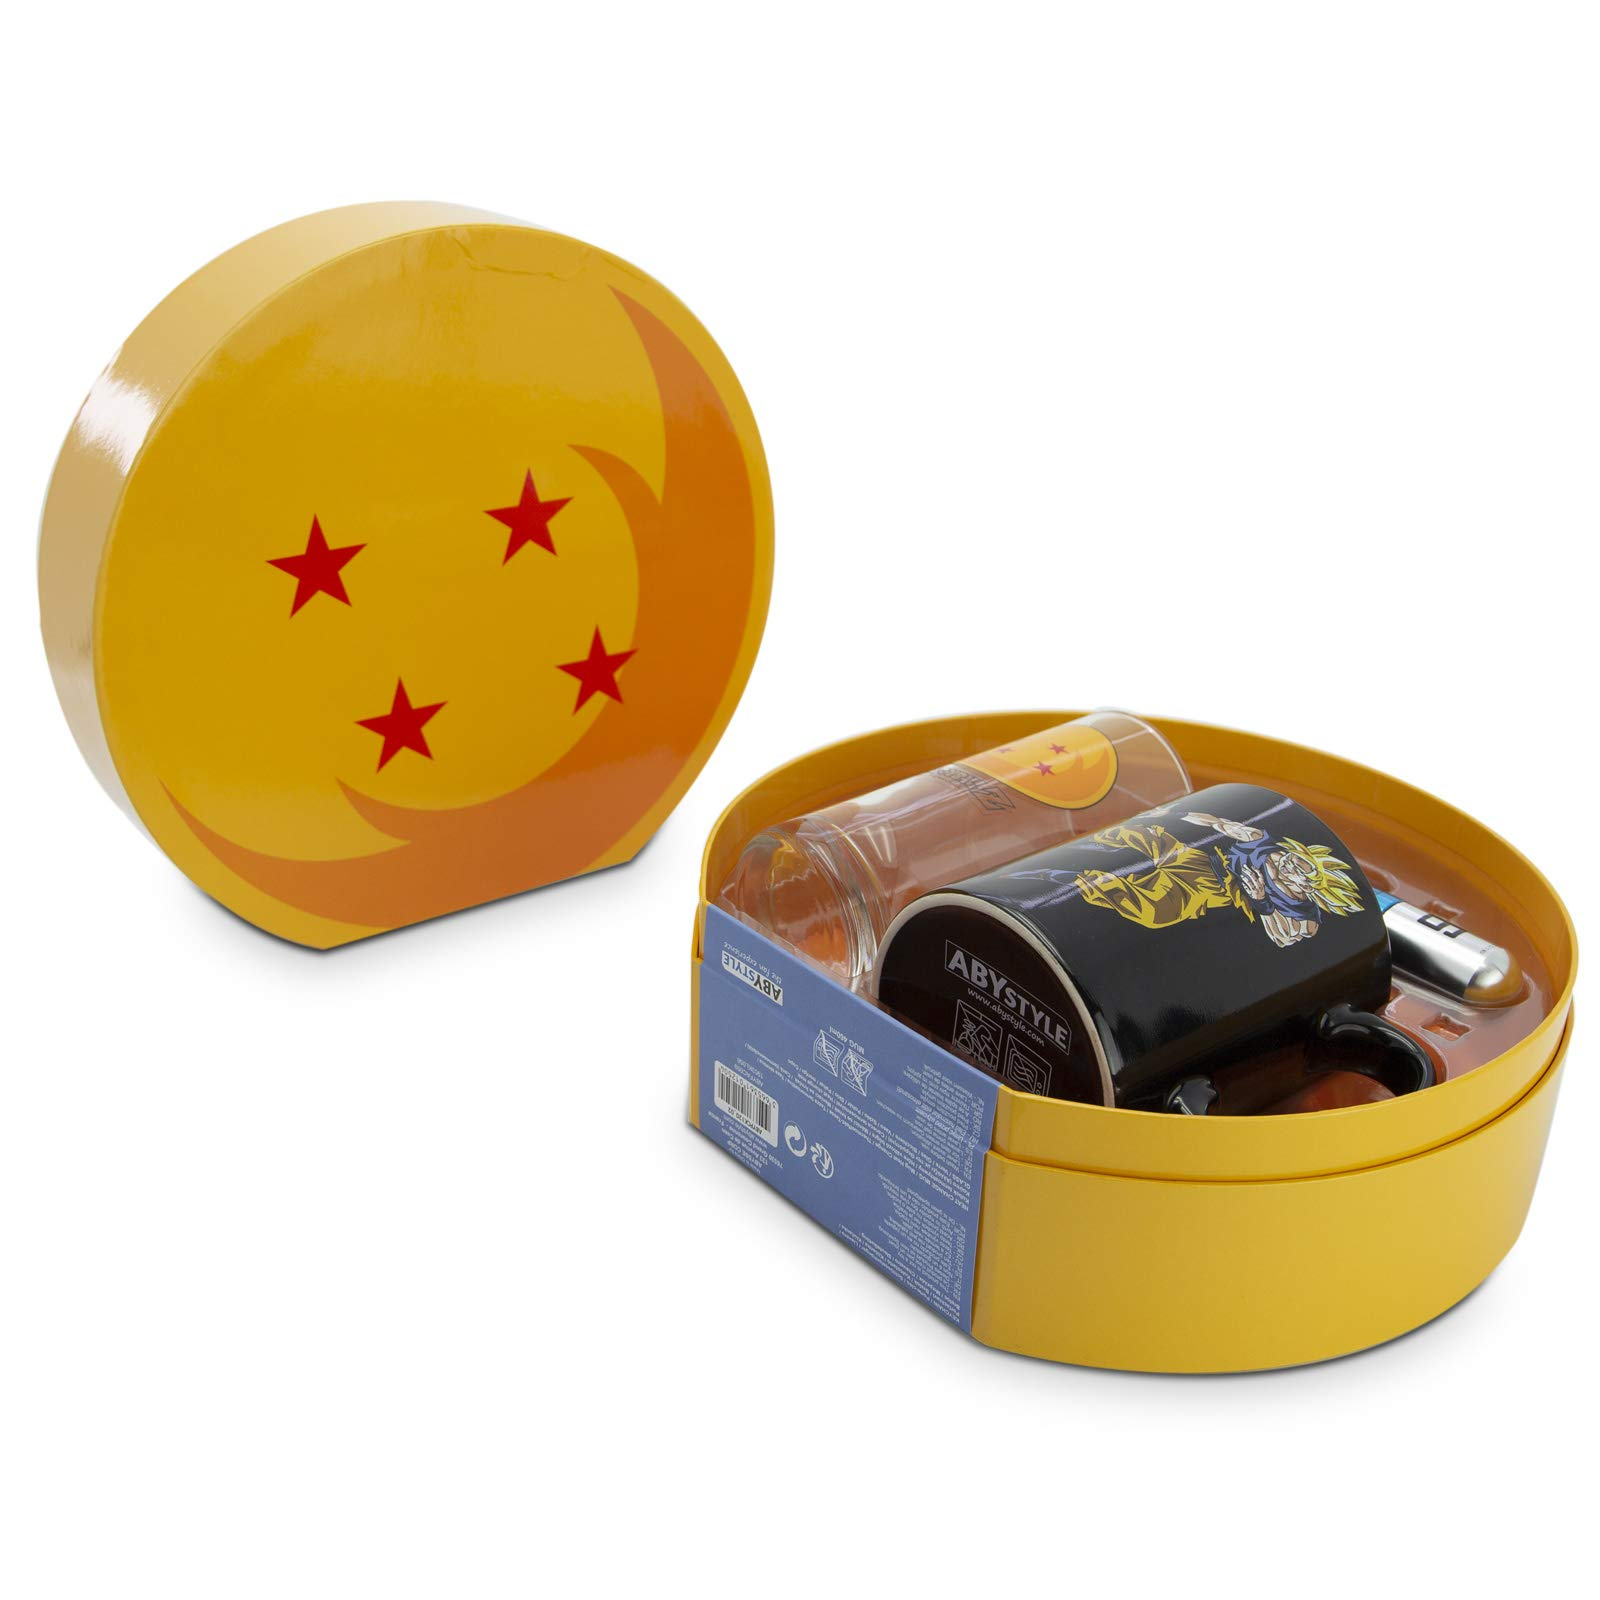 ABYstyle - Dragon Ball - Caja de Regalo con Bolas de Cristal Premium - Vaso + Llavero 3D + Taza Termo-reactiva: Amazon.es: Hogar